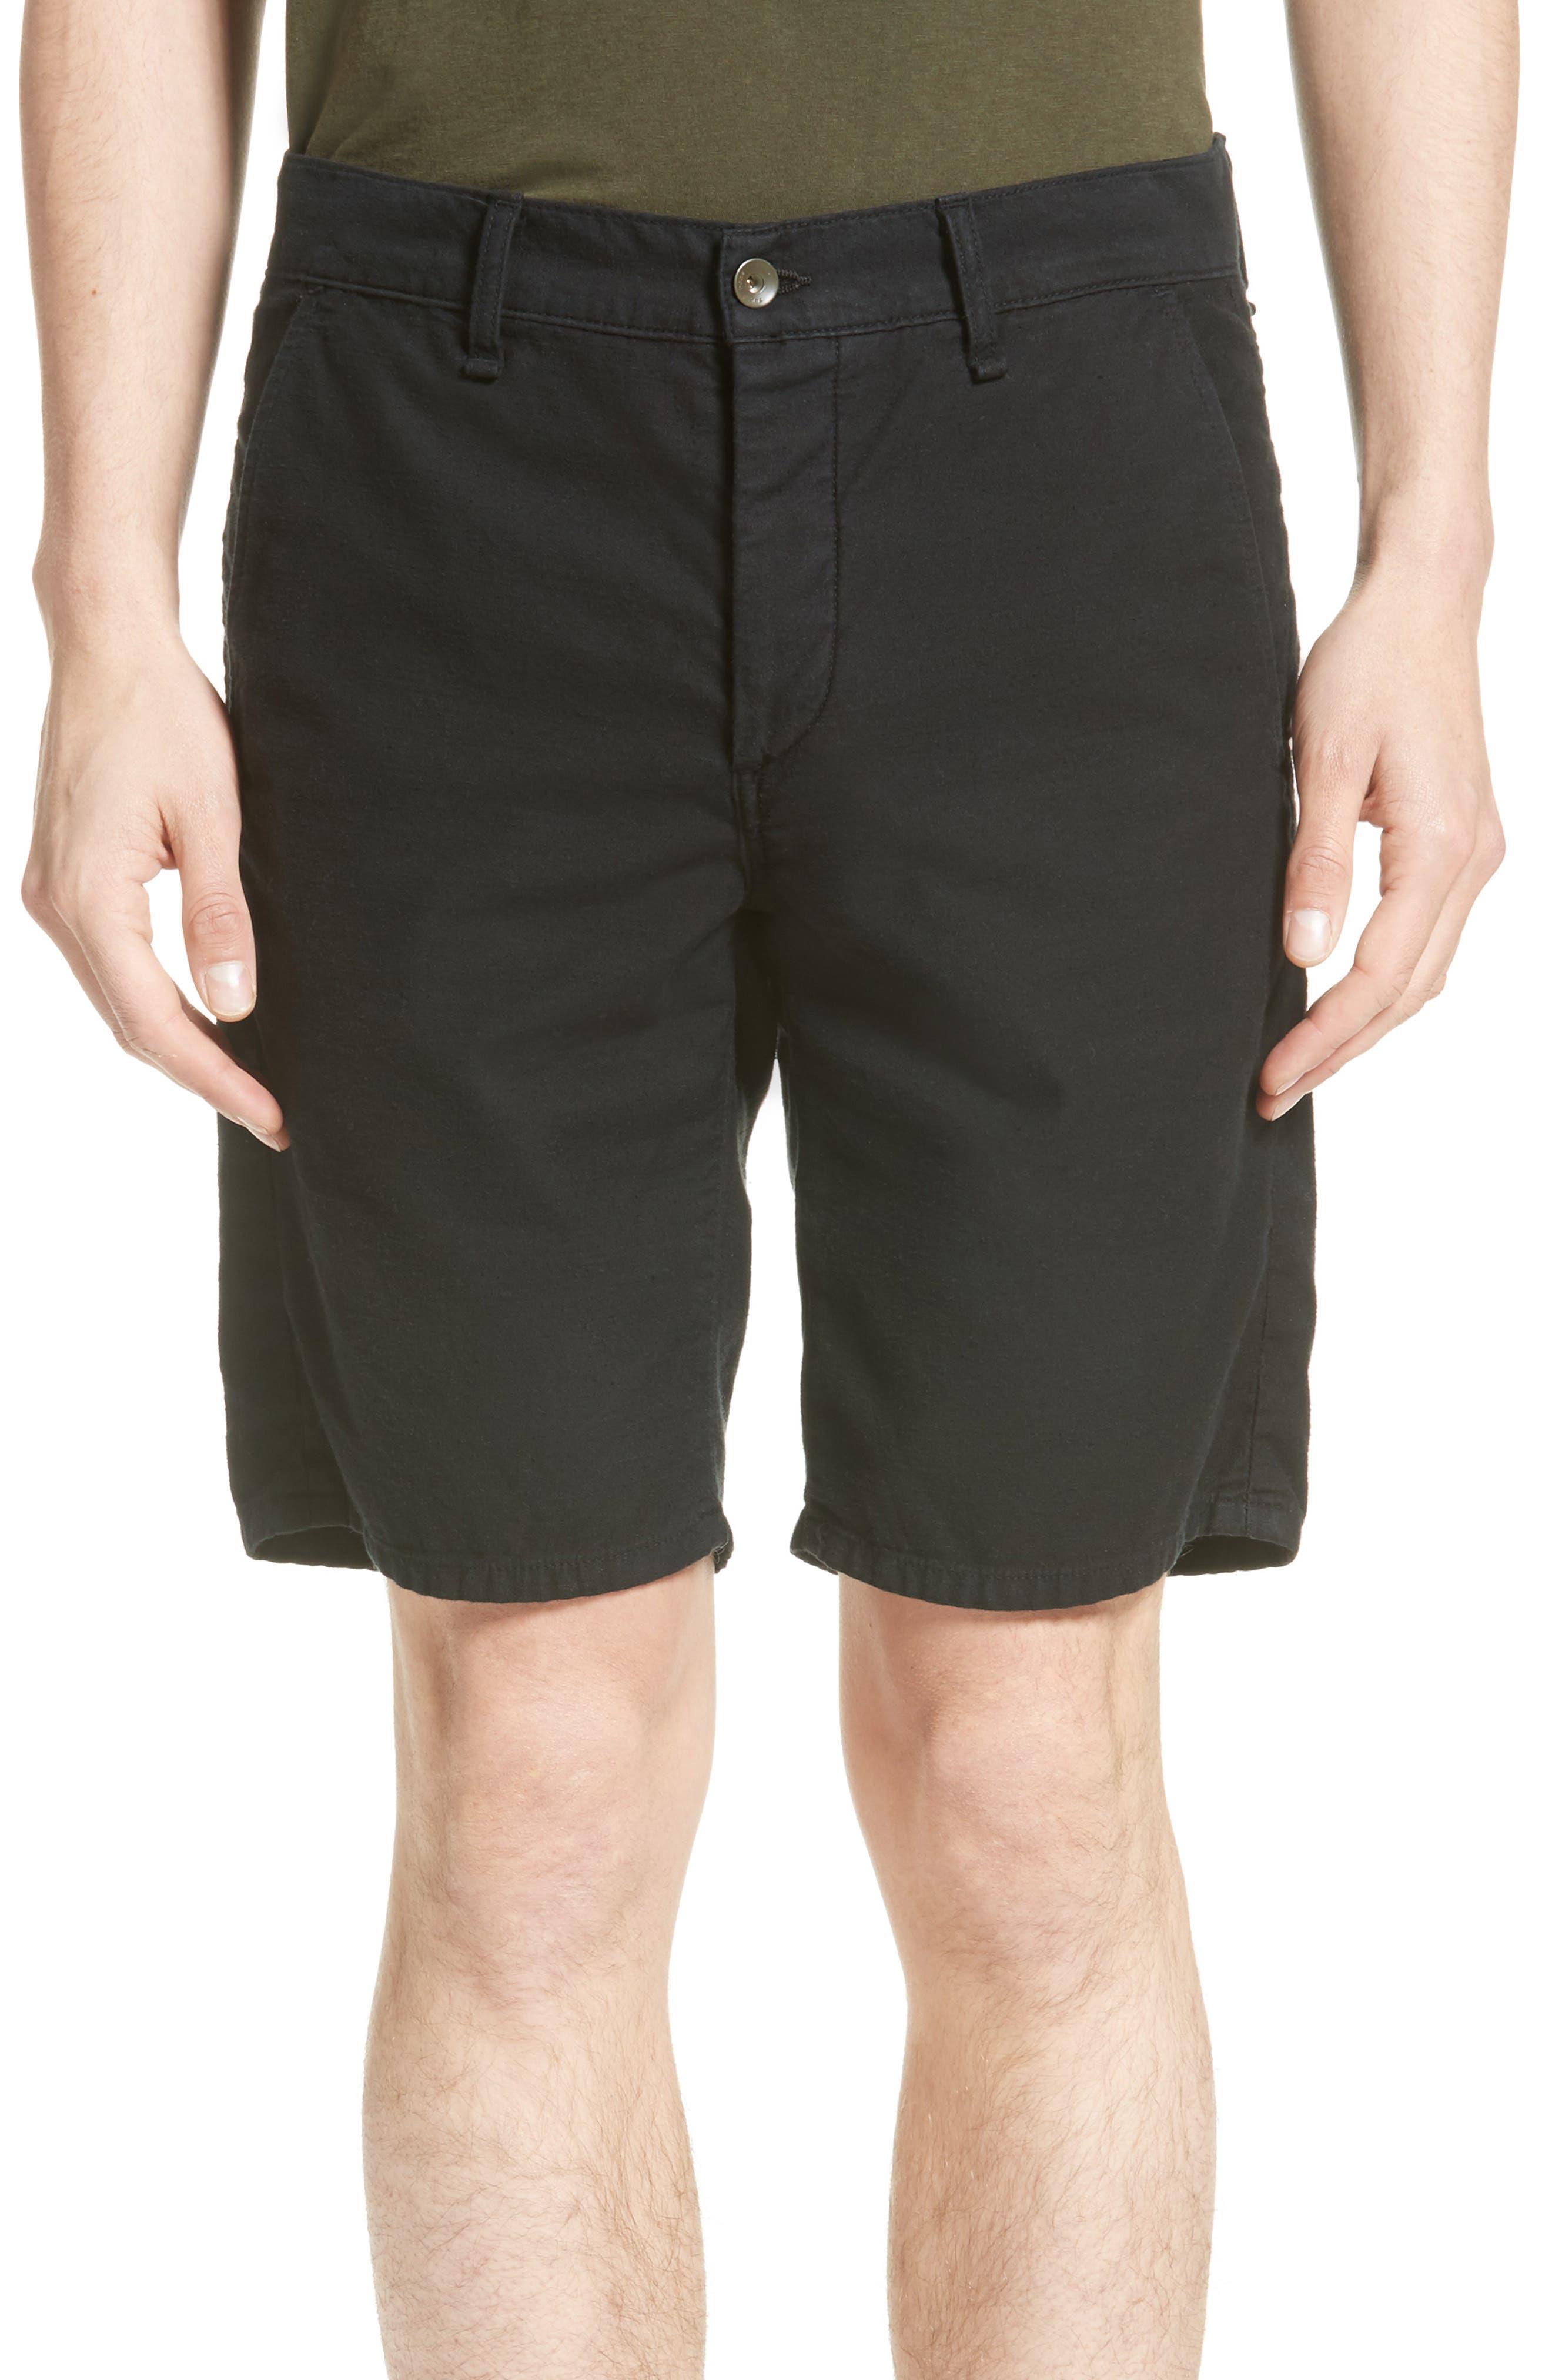 Alternate Image 1 Selected - rag & bone Standard Issue Shorts